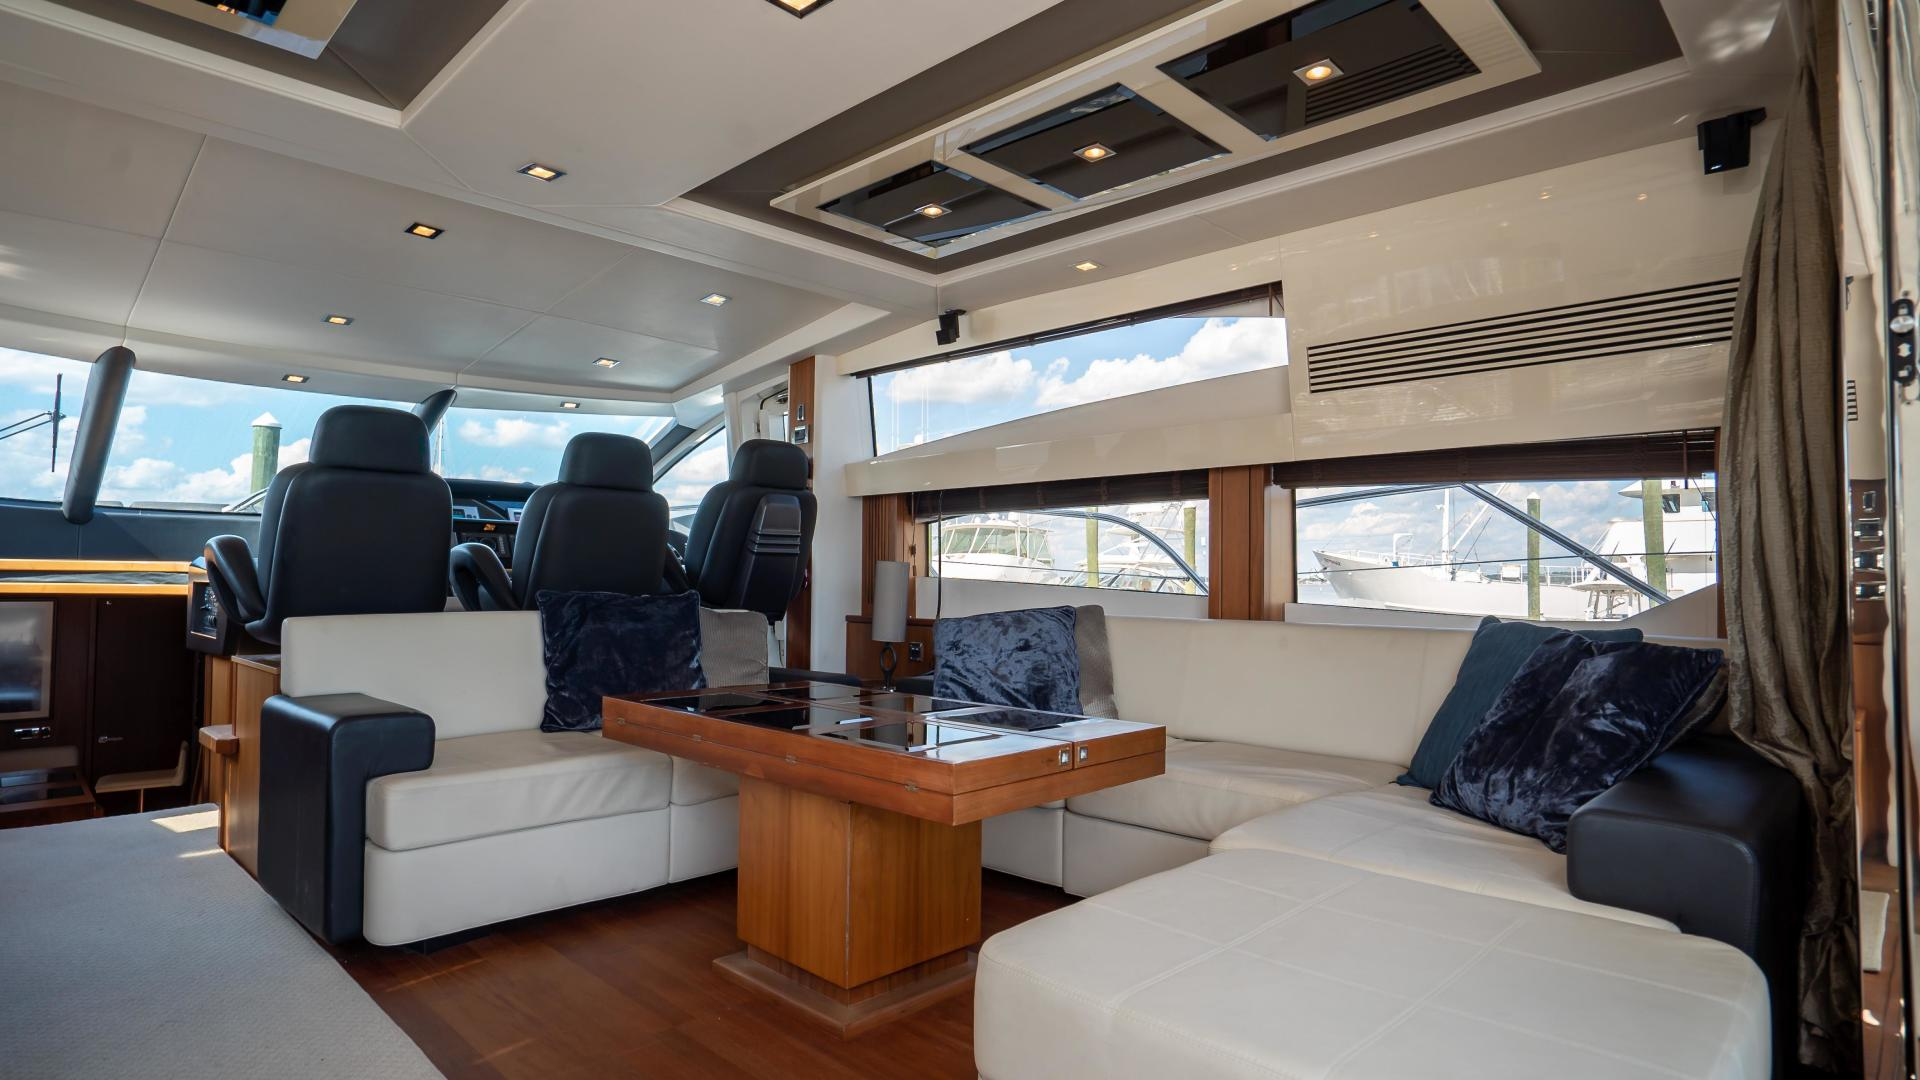 Sunseeker-Motor yacht 2012-JIMBO New Port-Rhode Island-United States-1480221 | Thumbnail